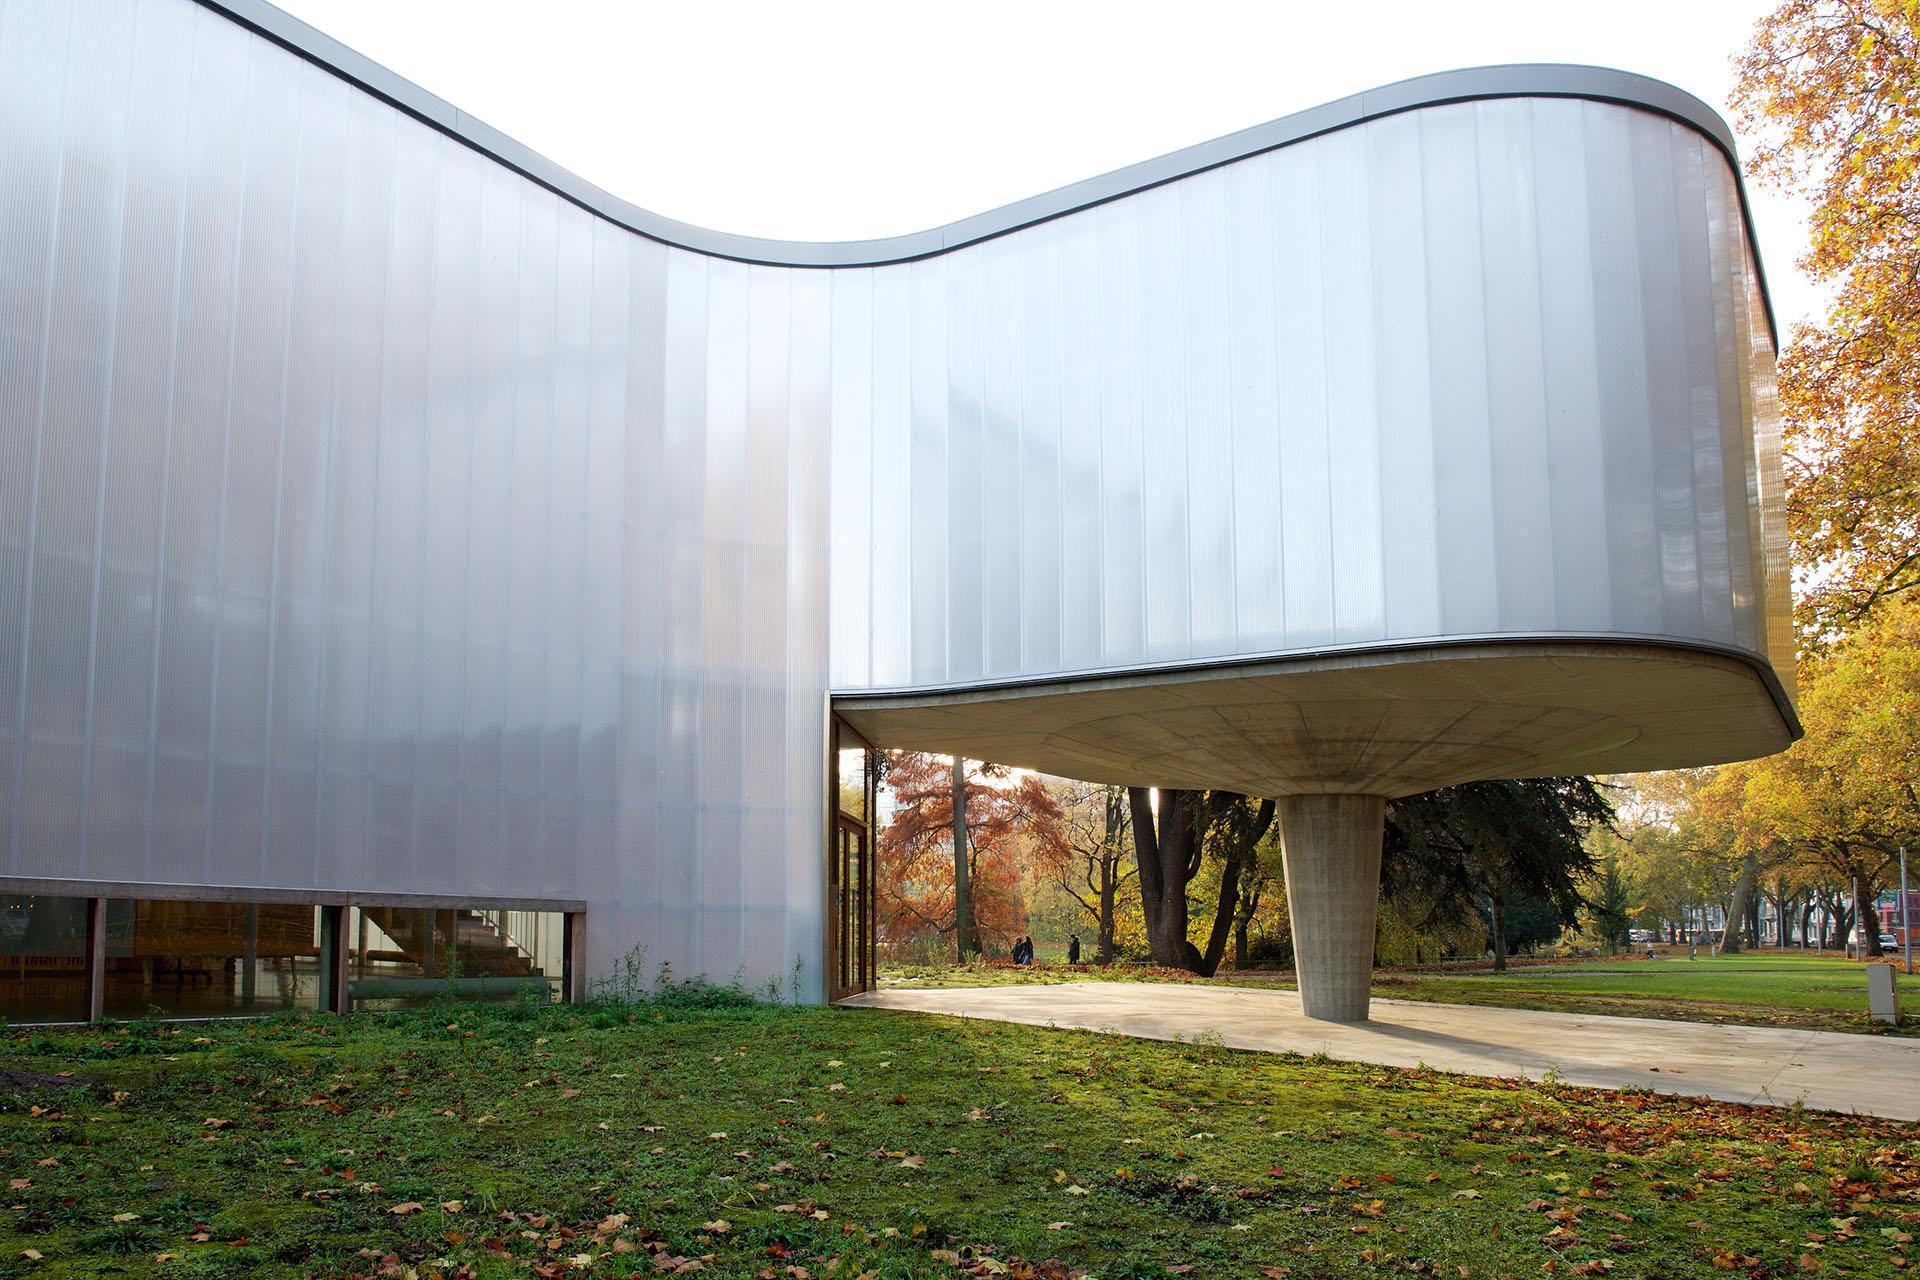 Trinkhall museum - Liège - vue extérieure 2